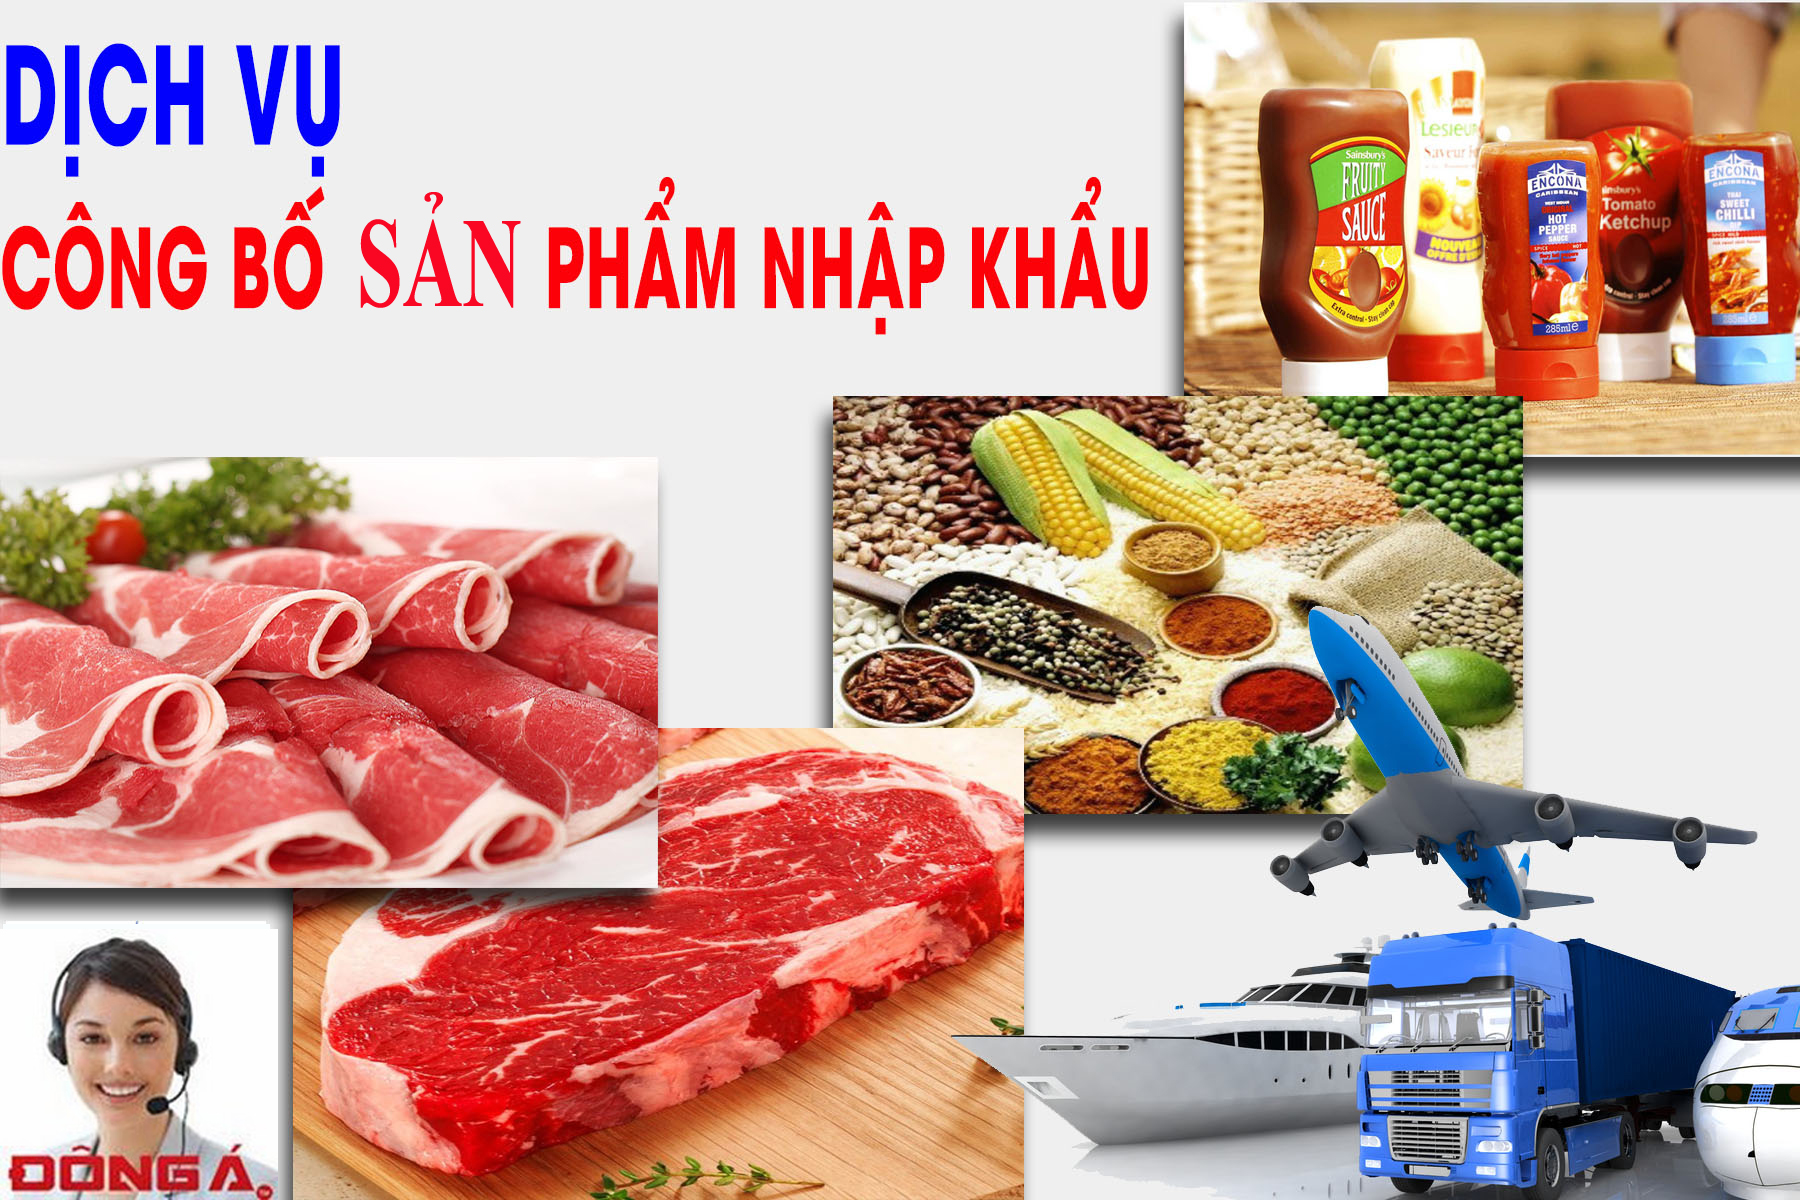 cong-bo-san-pham-nhap-khau